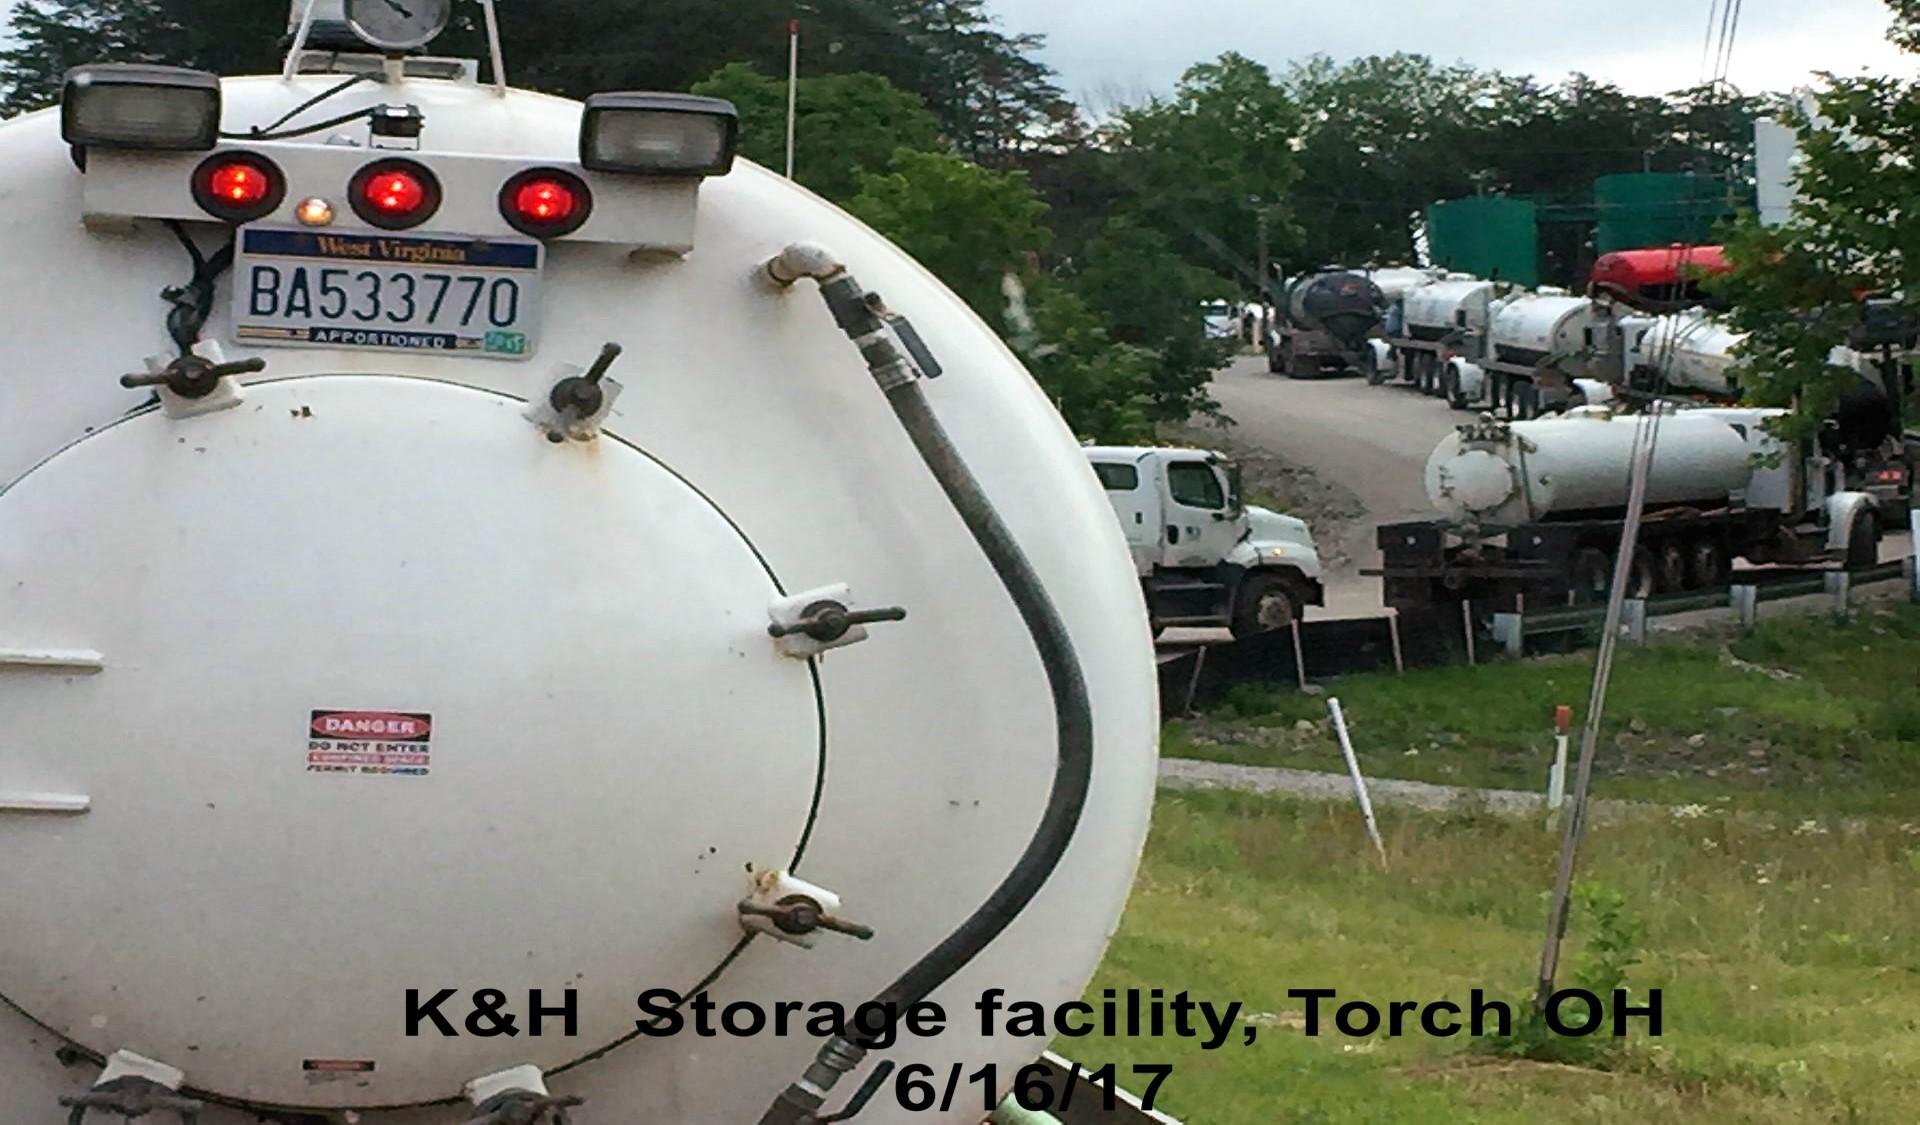 K&H Storage facility Torch Ohio 6-16-17.jpg